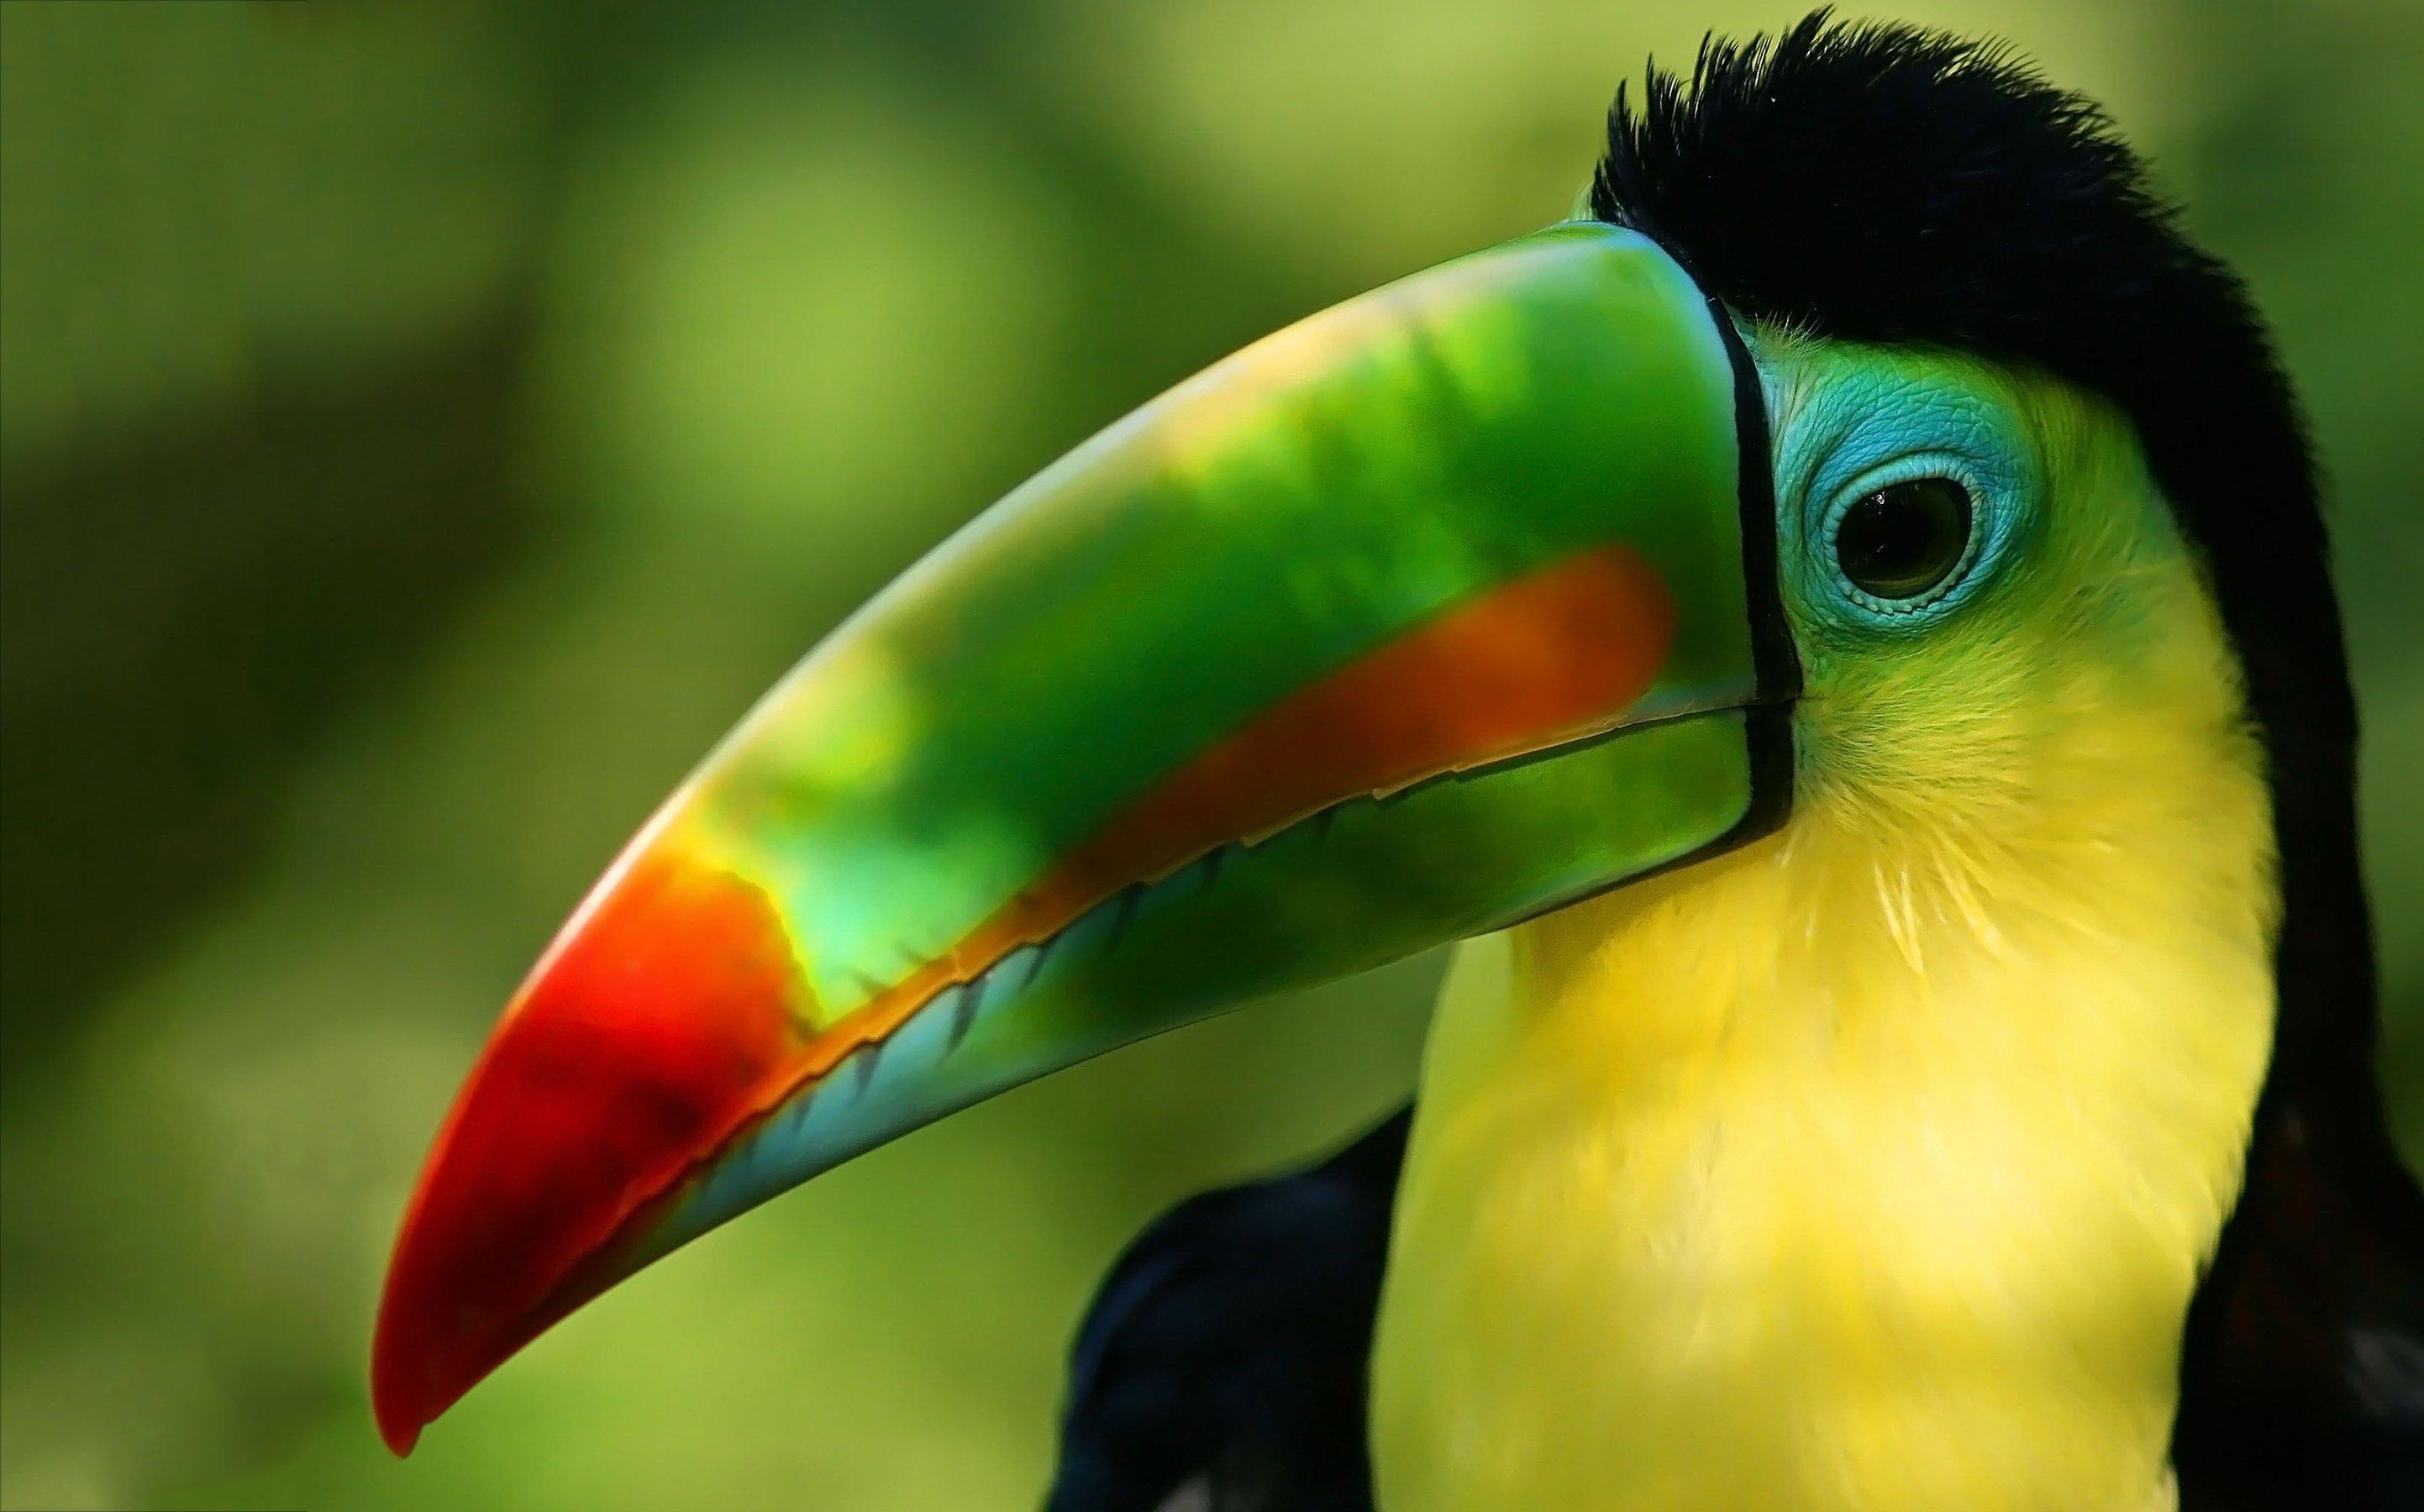 toucan parrot bird tropical (45) wallpaper | 2885x1800 | 363496